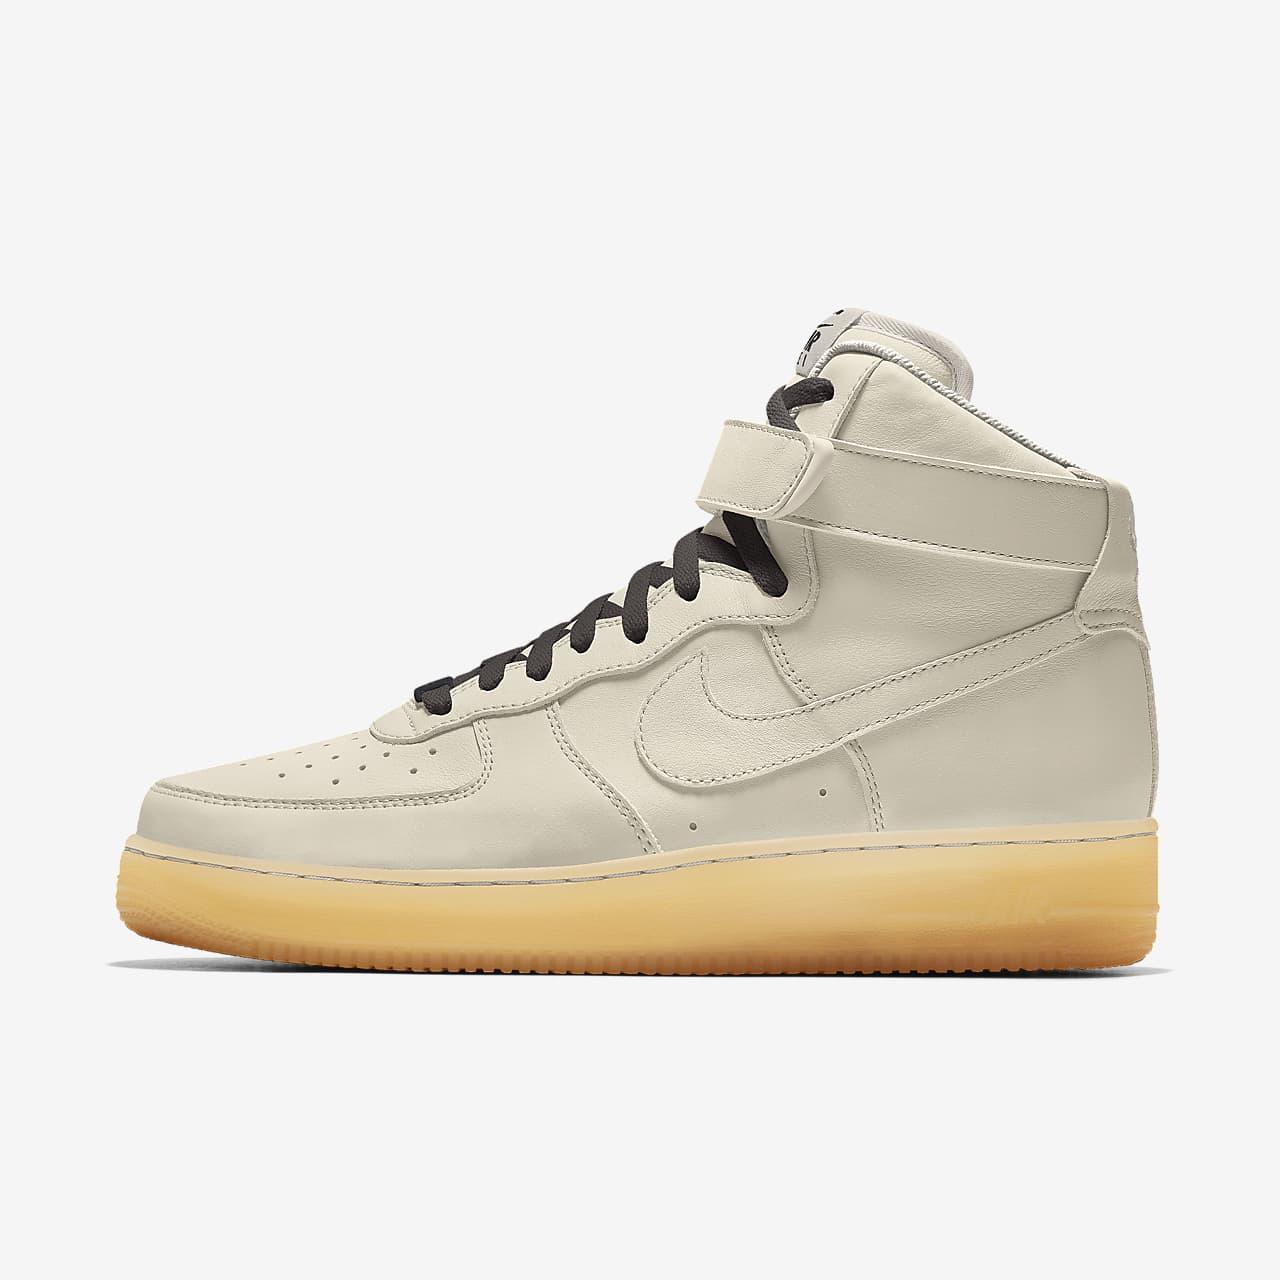 Nike Air Force 1 High By You Custom Men's Shoe